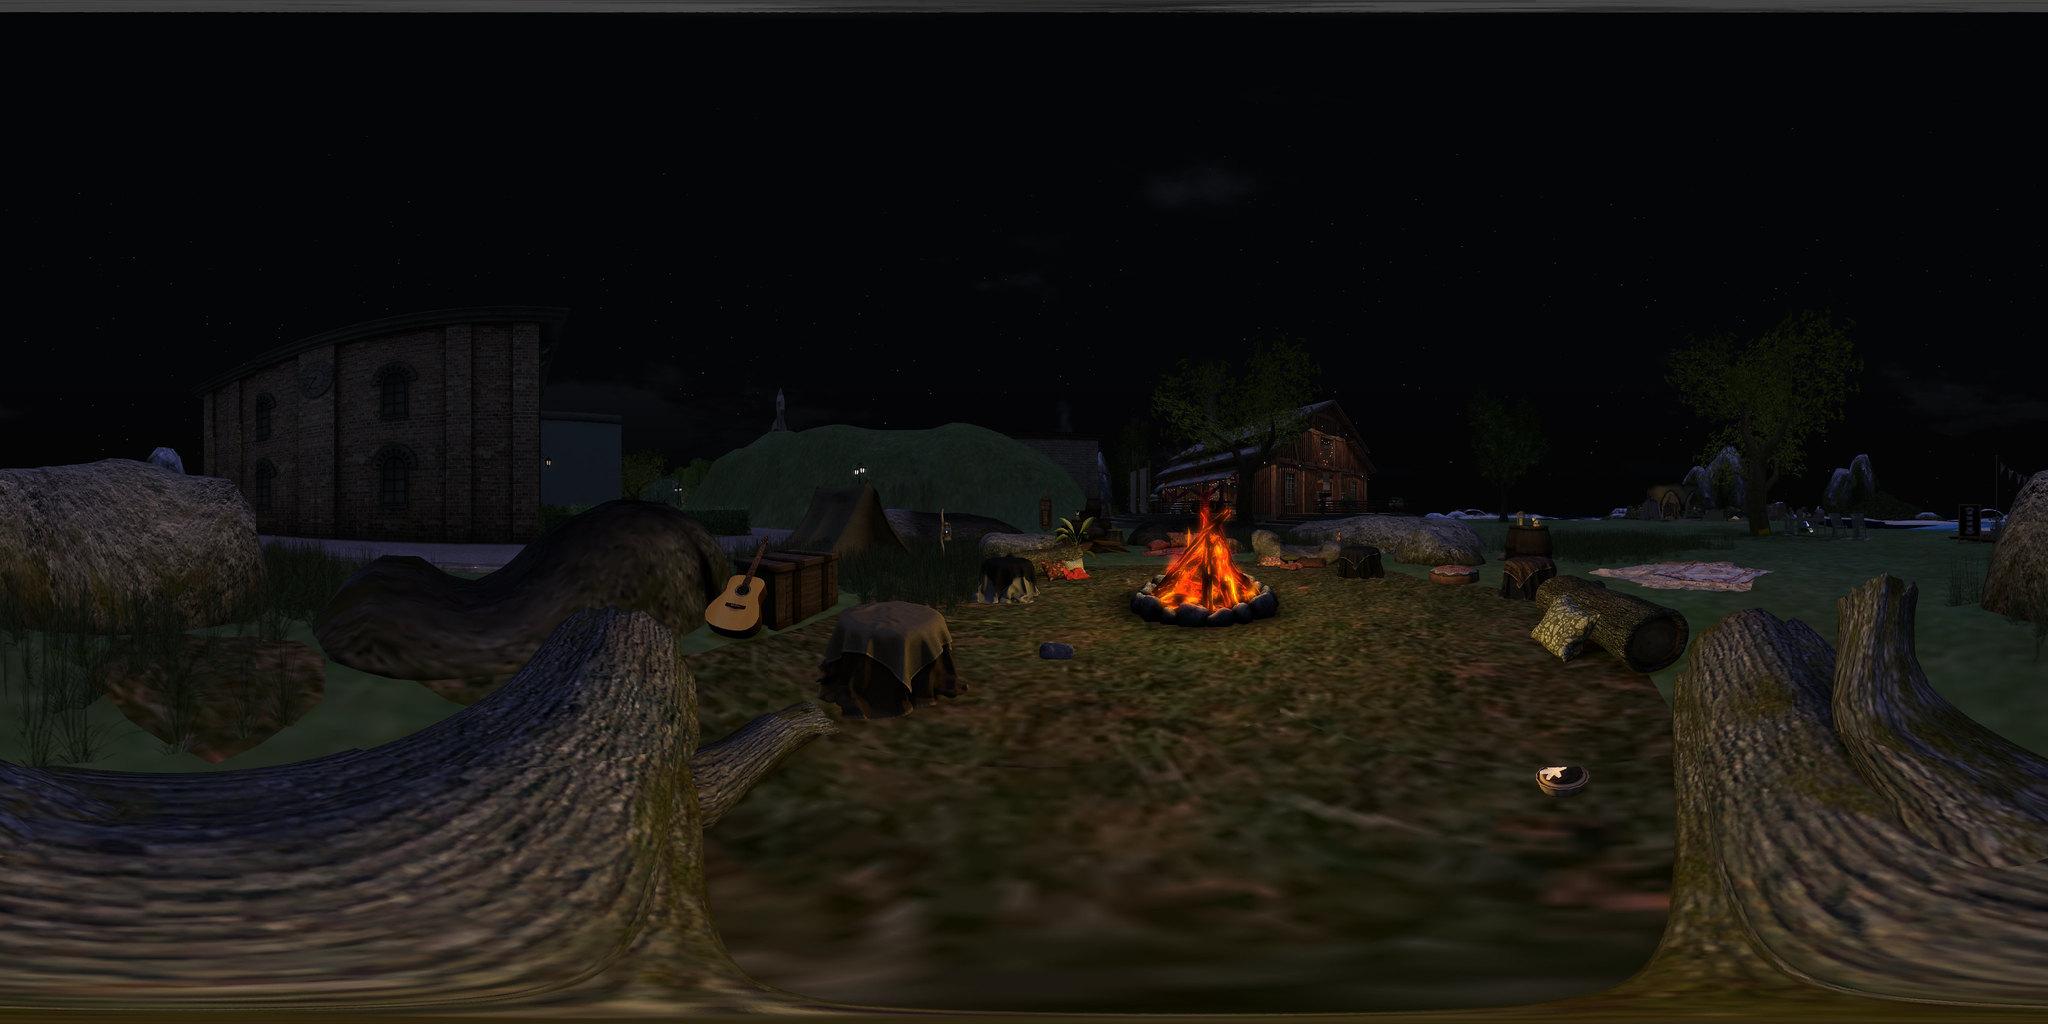 Campfire-360